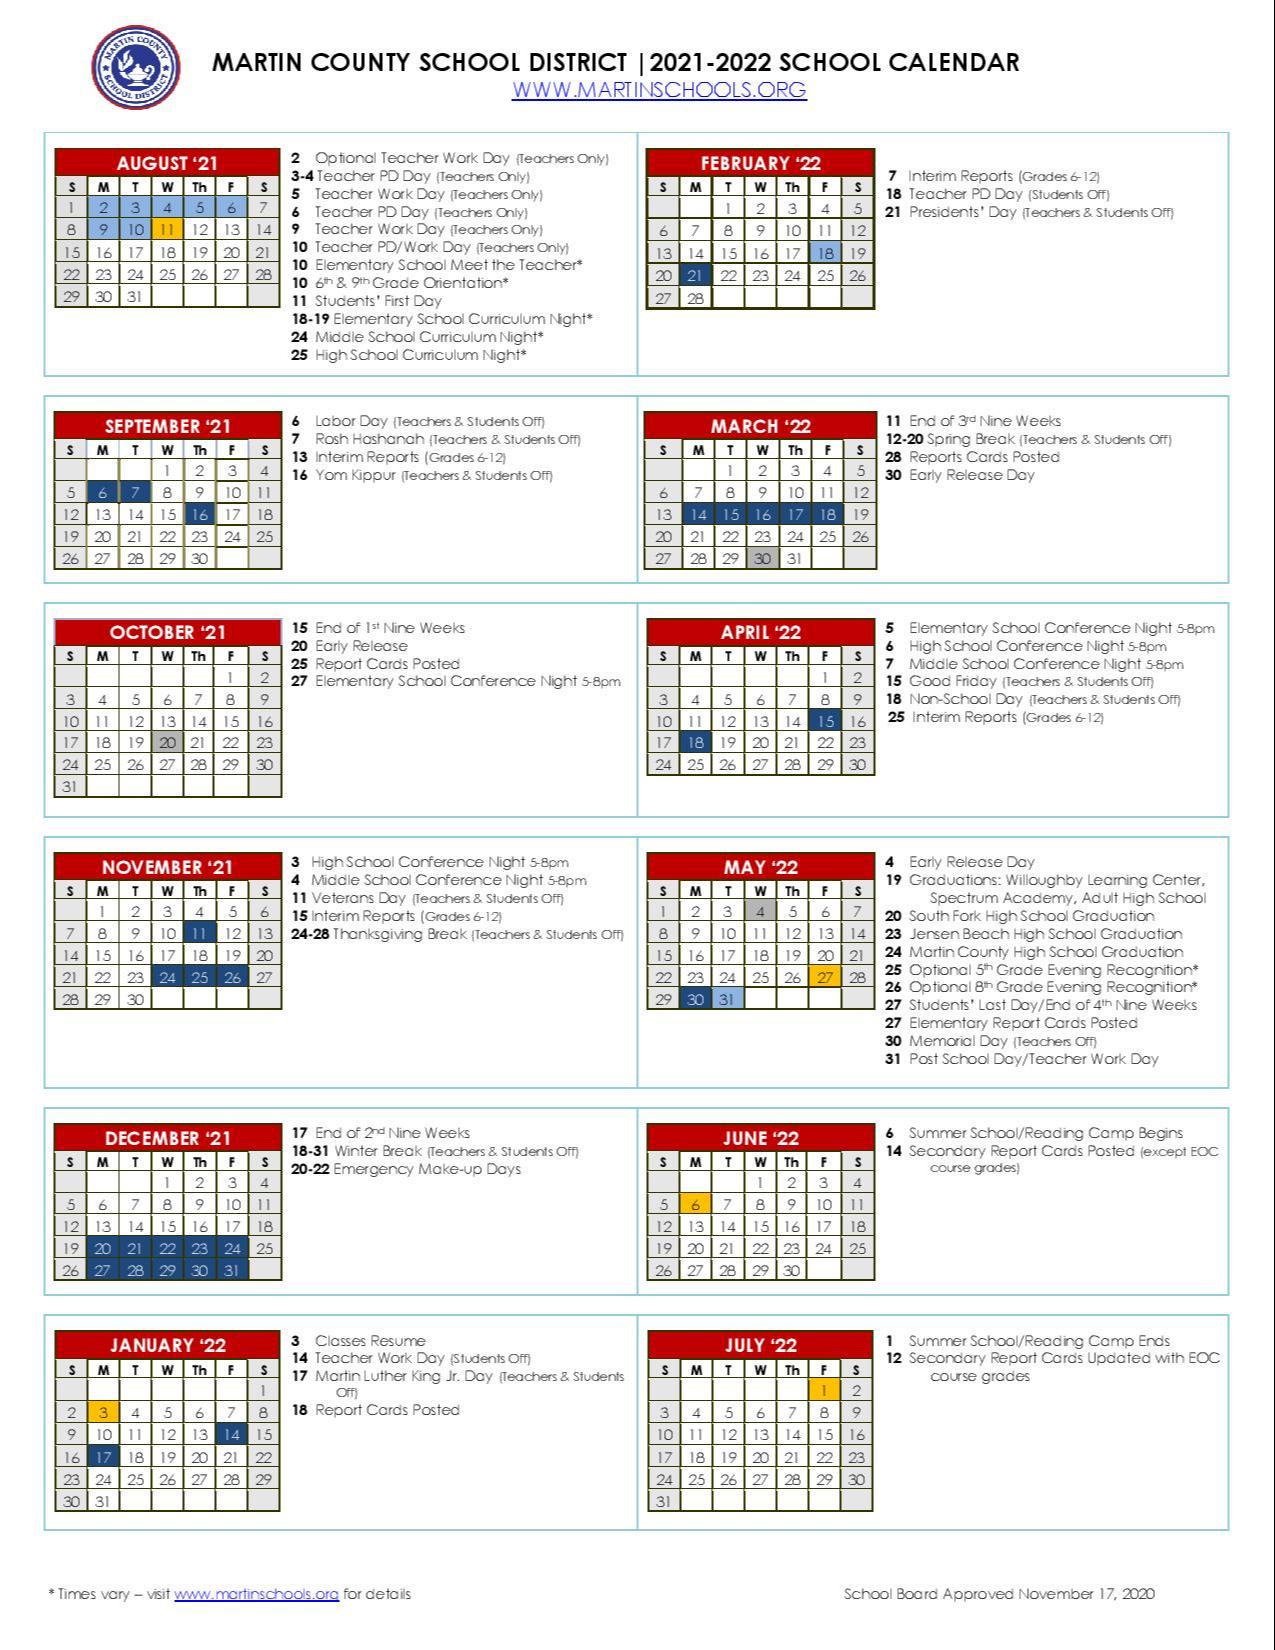 2021-2022 Instructional Calendar